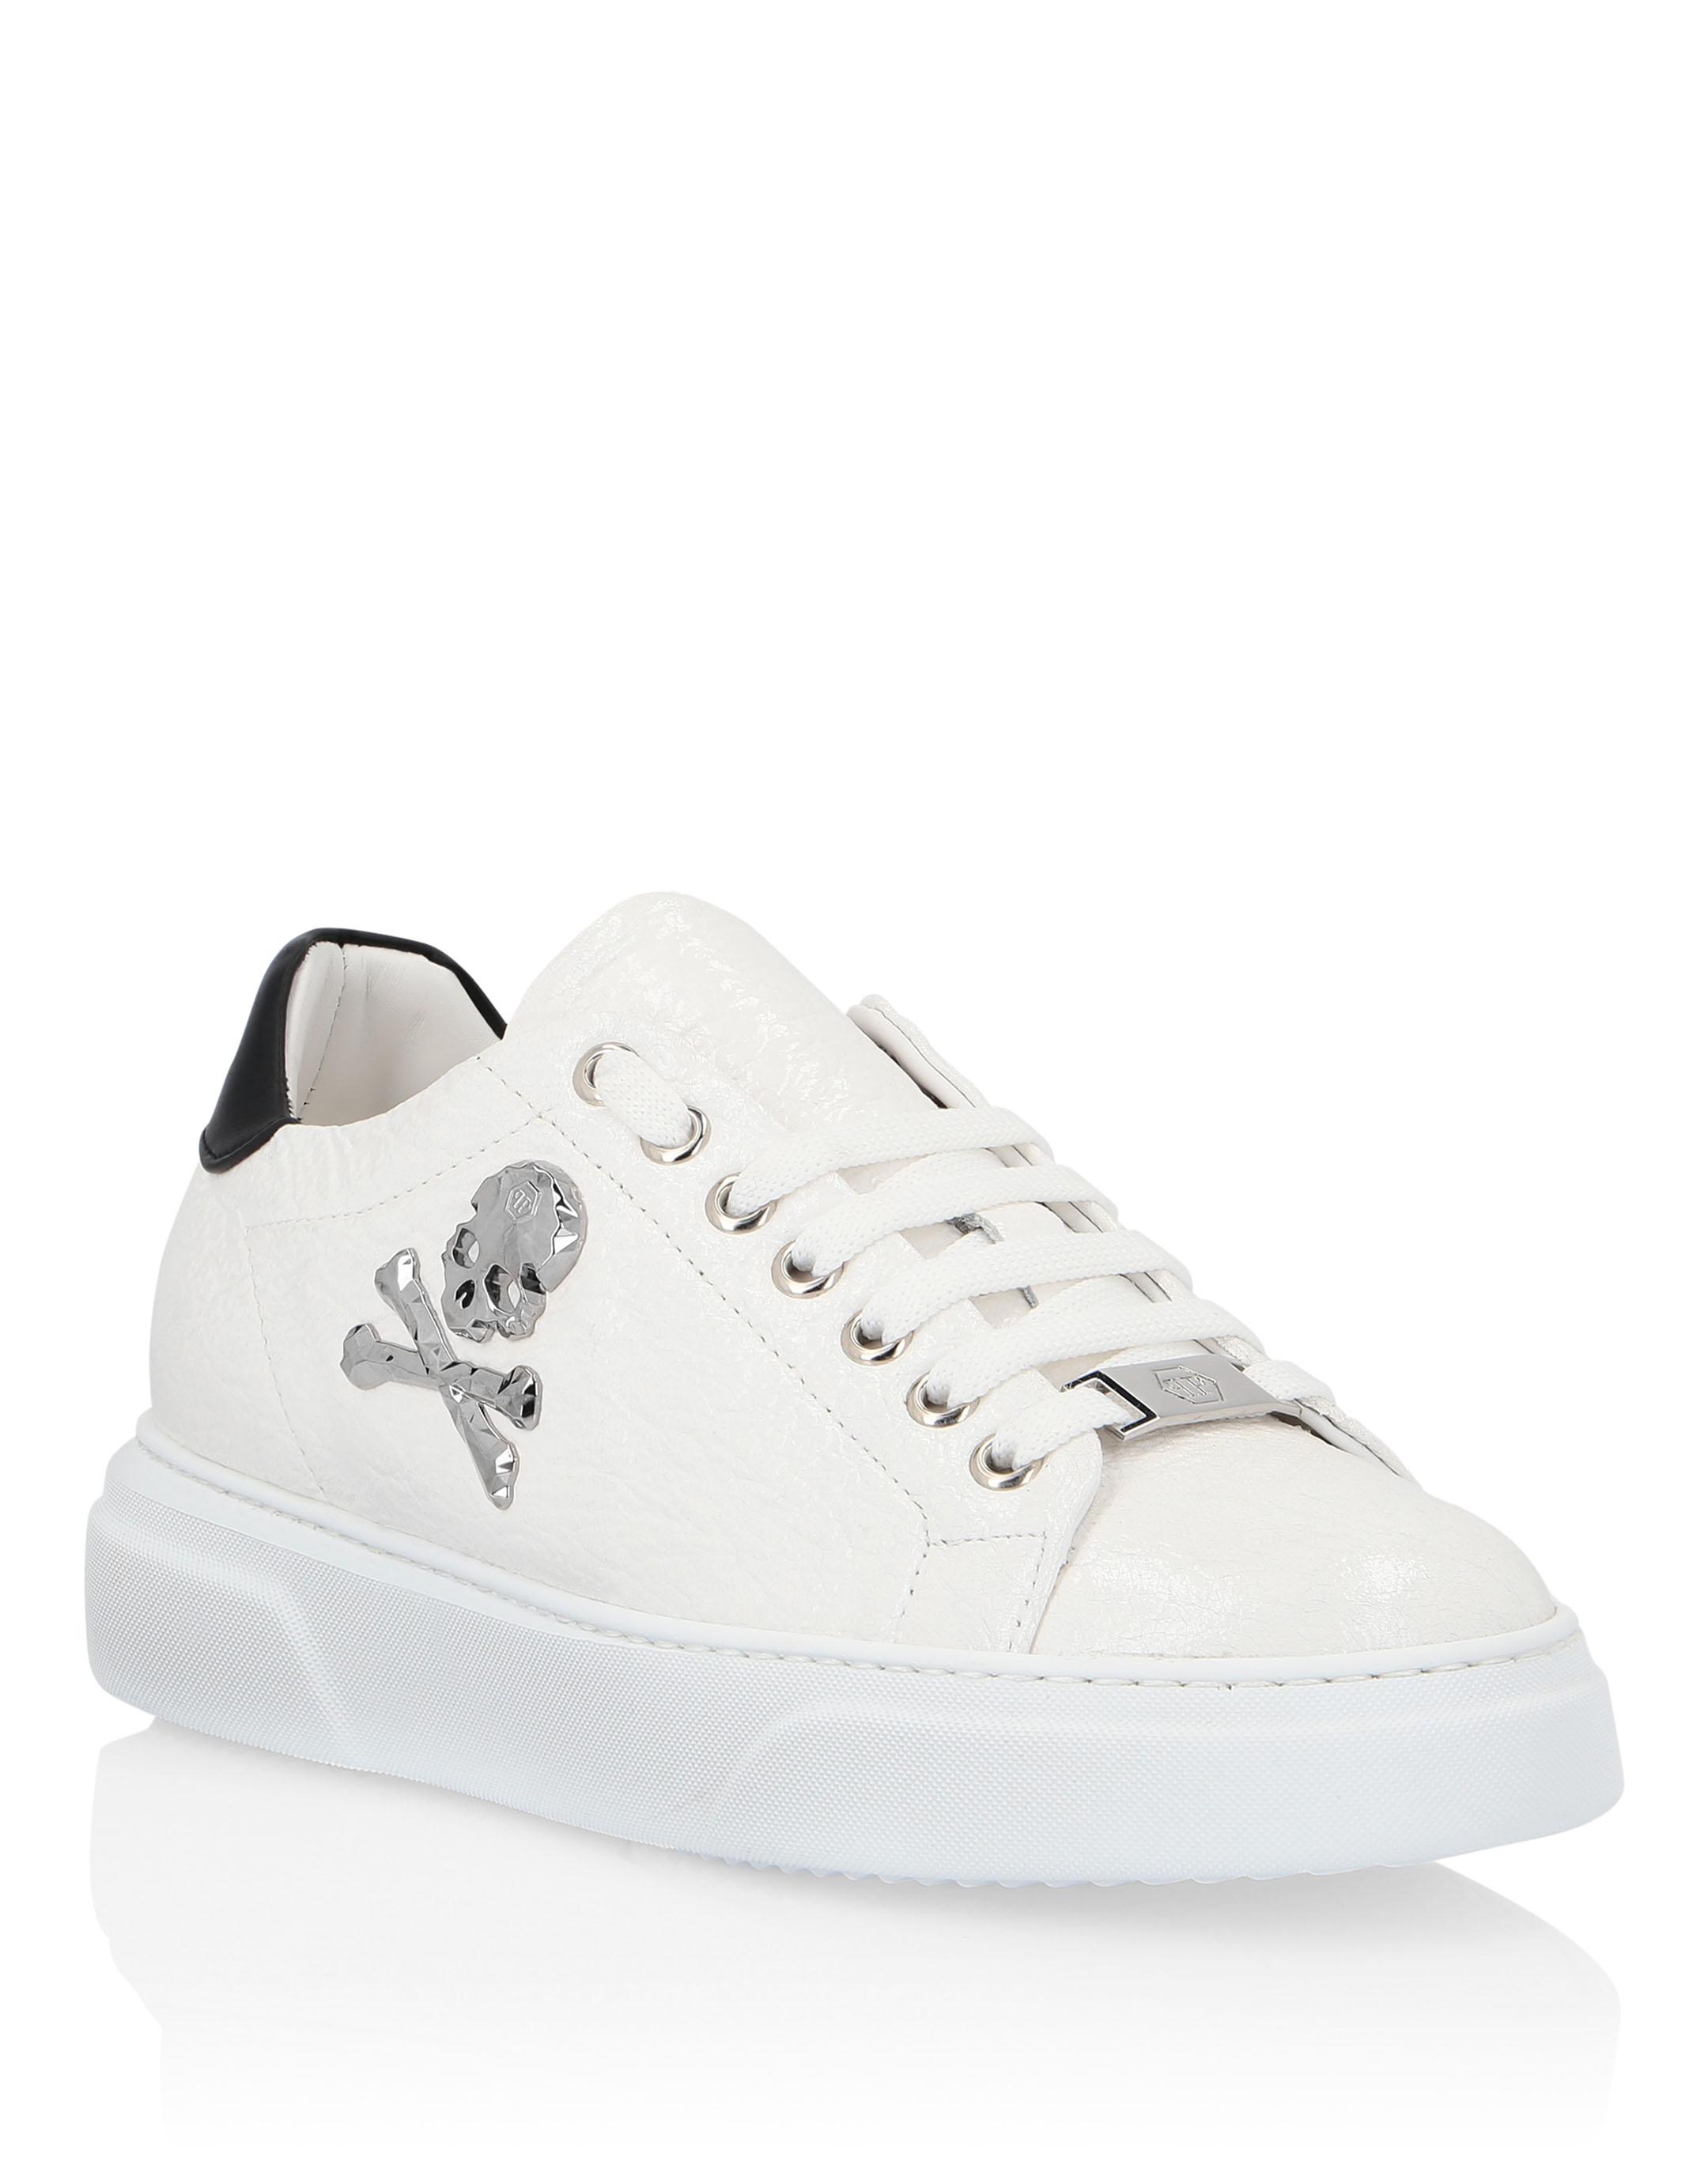 Lo-Top Sneakers Skull | Philipp Plein